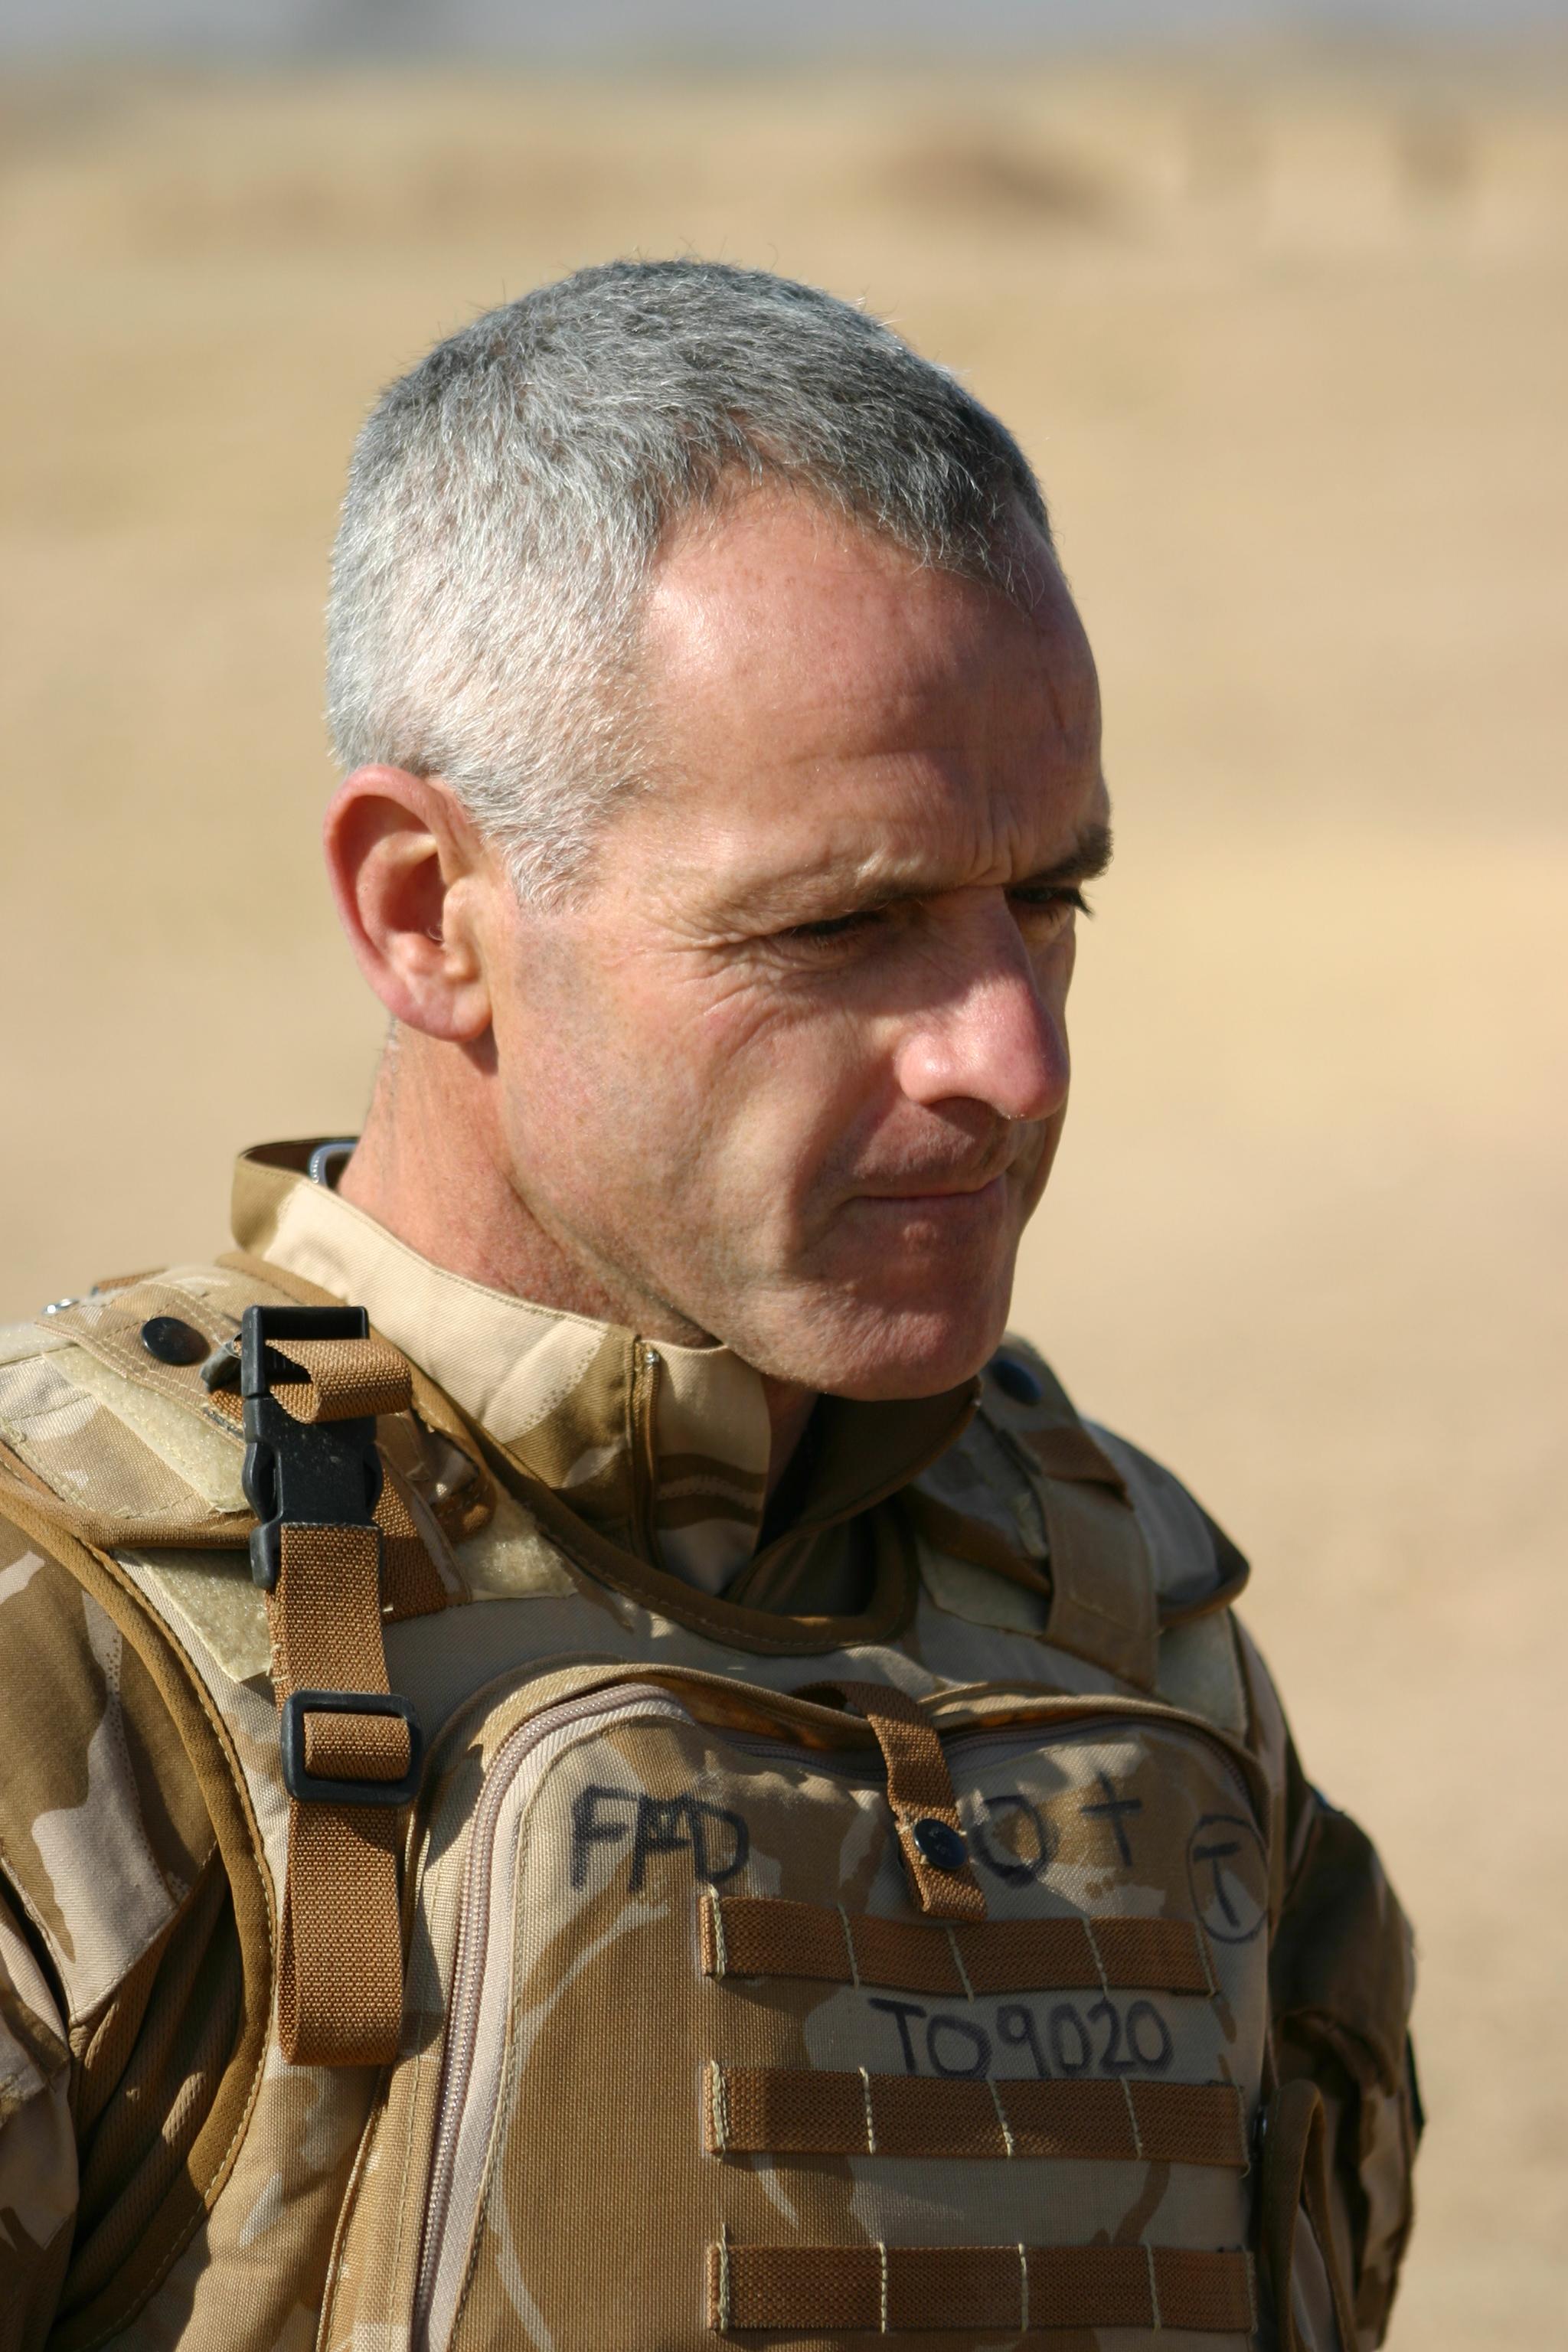 Matt in Afghanistan close up